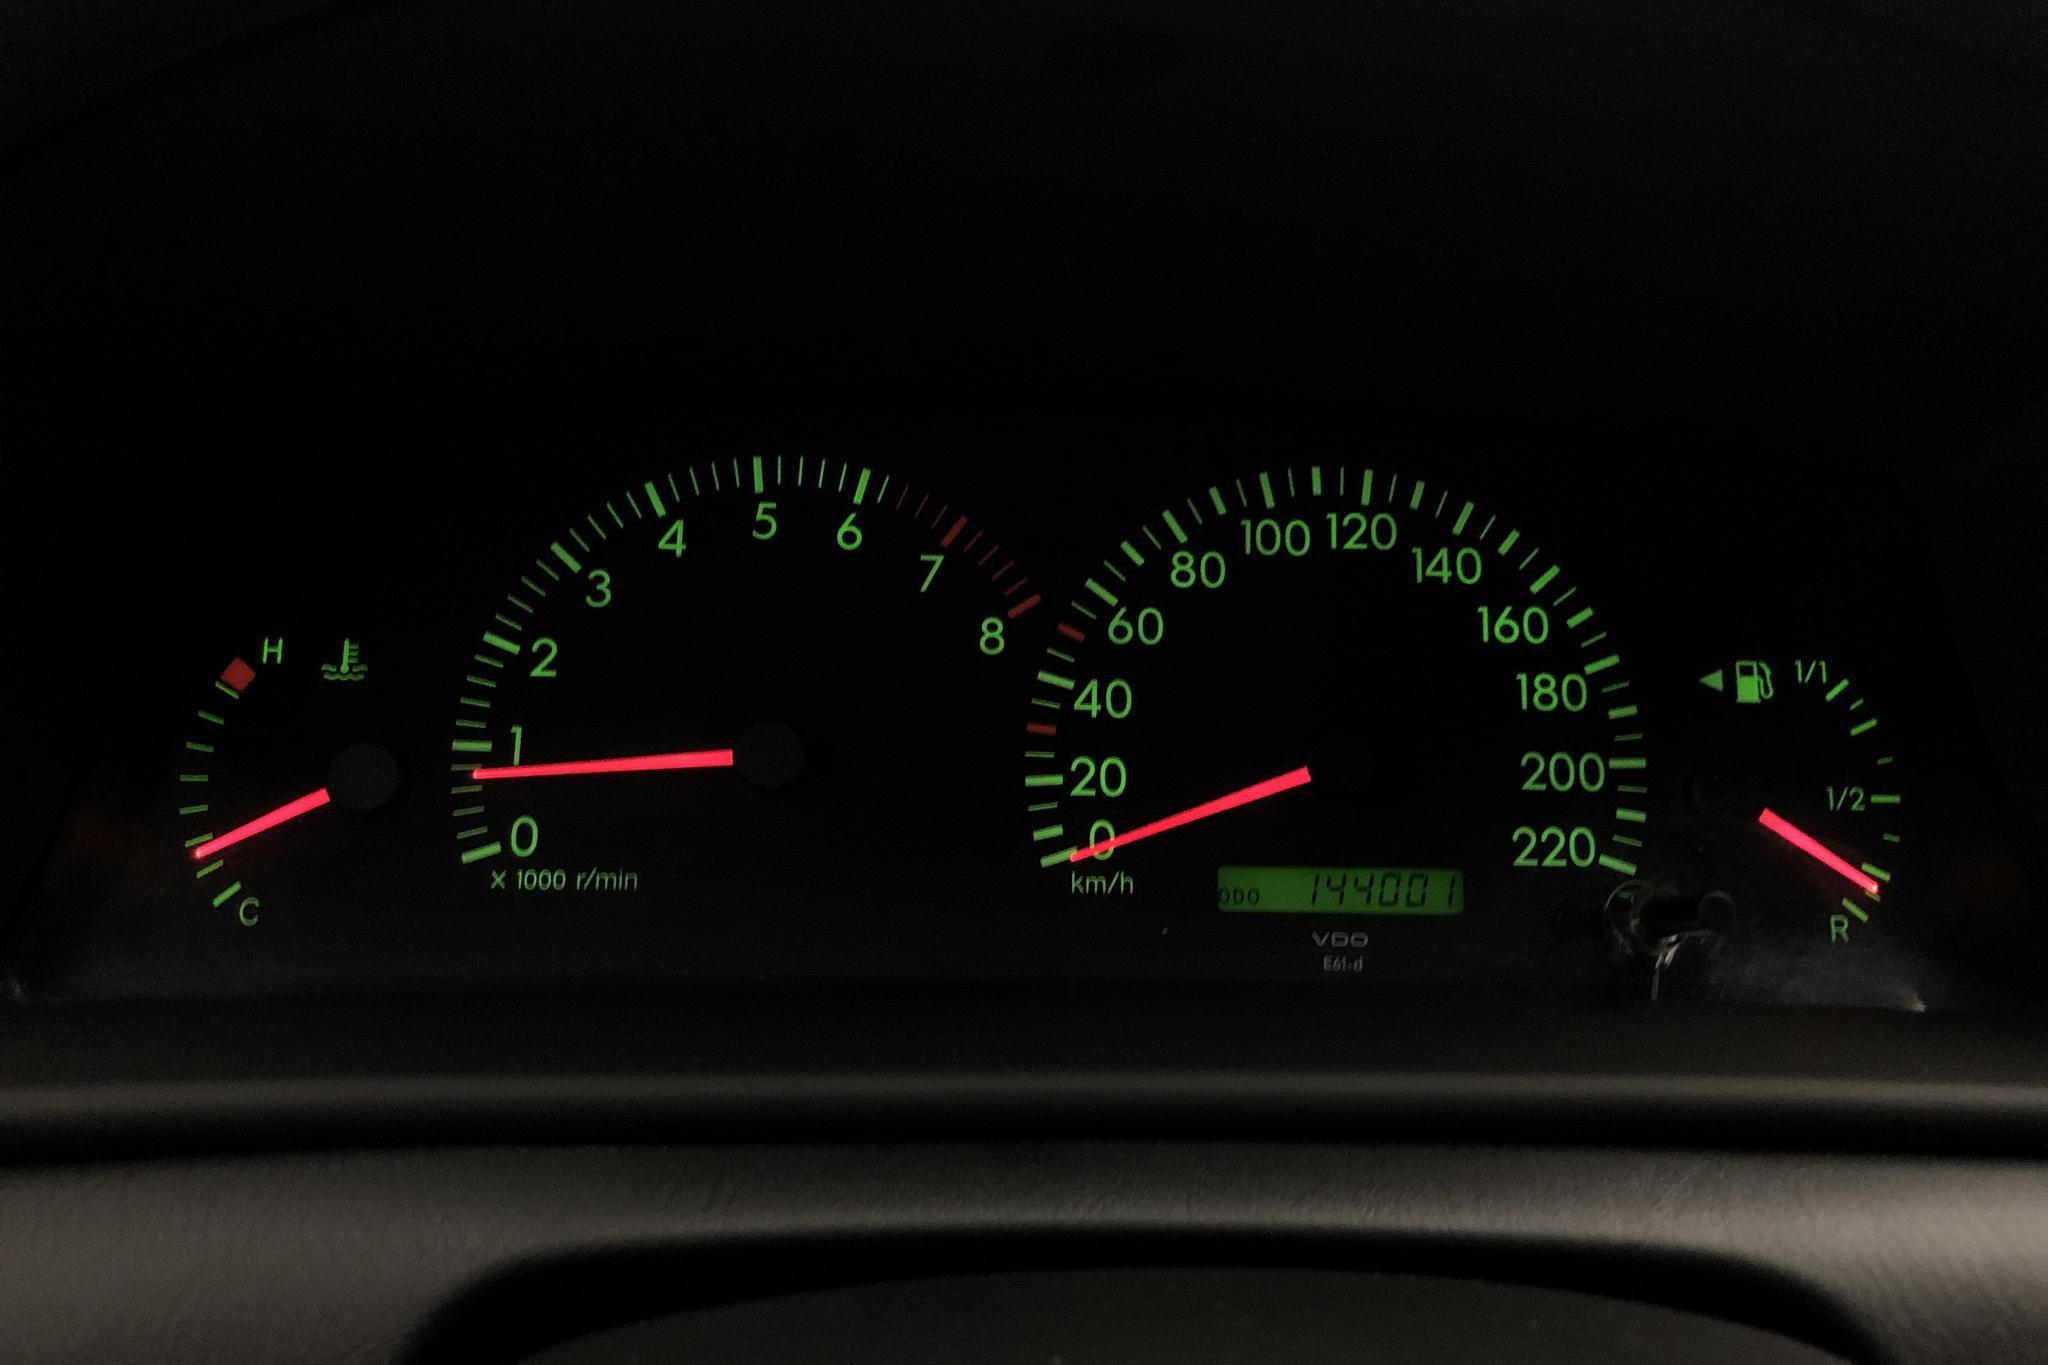 Toyota Corolla 1.4 5dr (97hk) - 143 990 km - Manual - silver - 2004